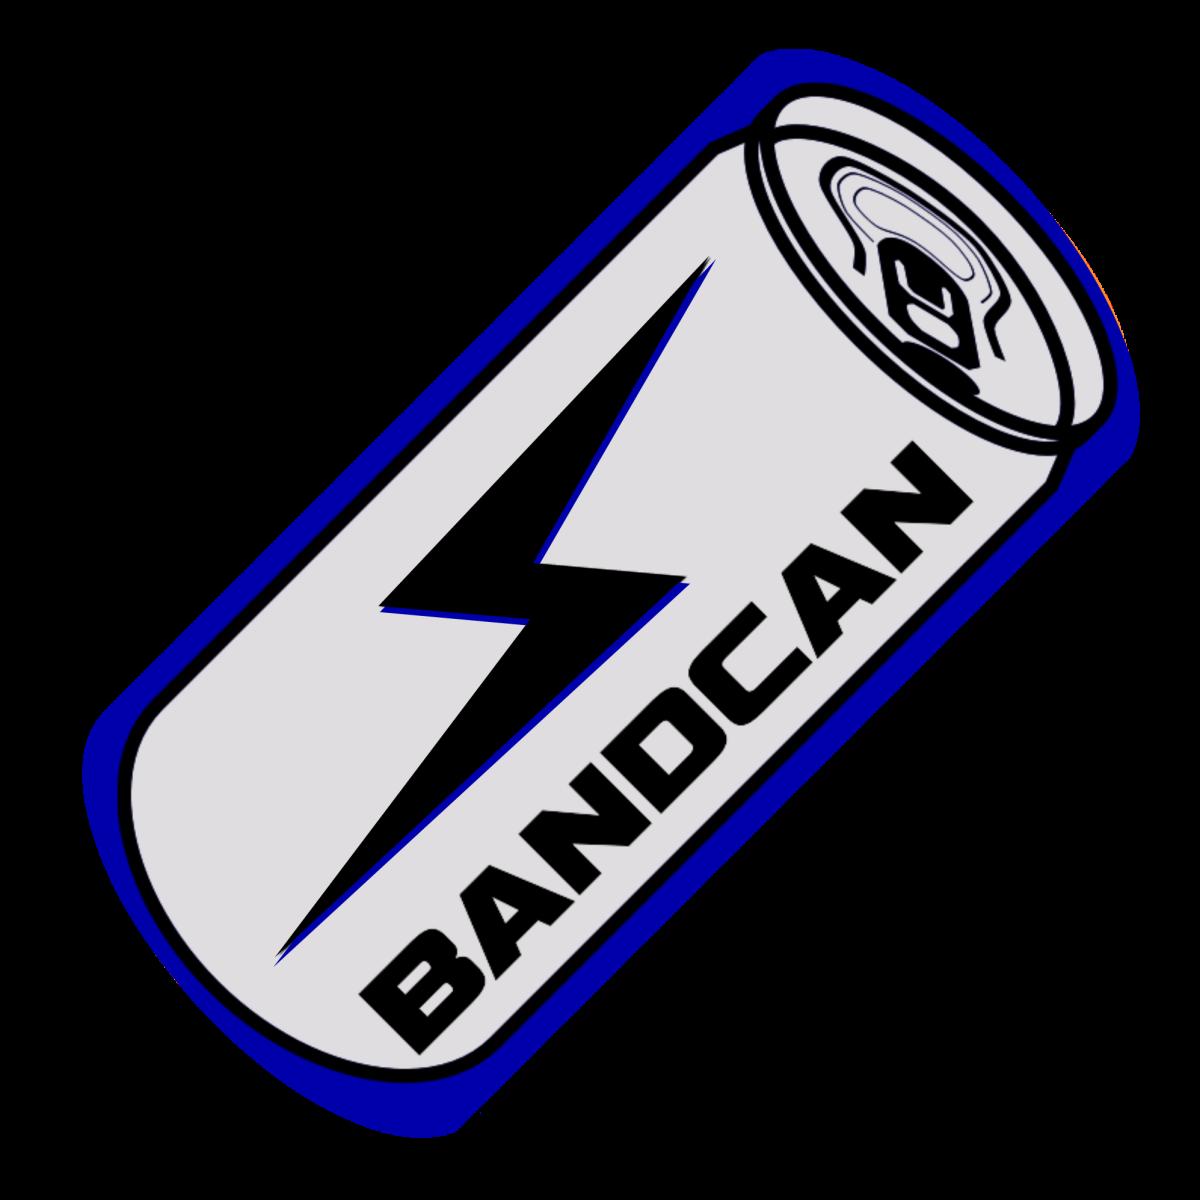 BANDCAN